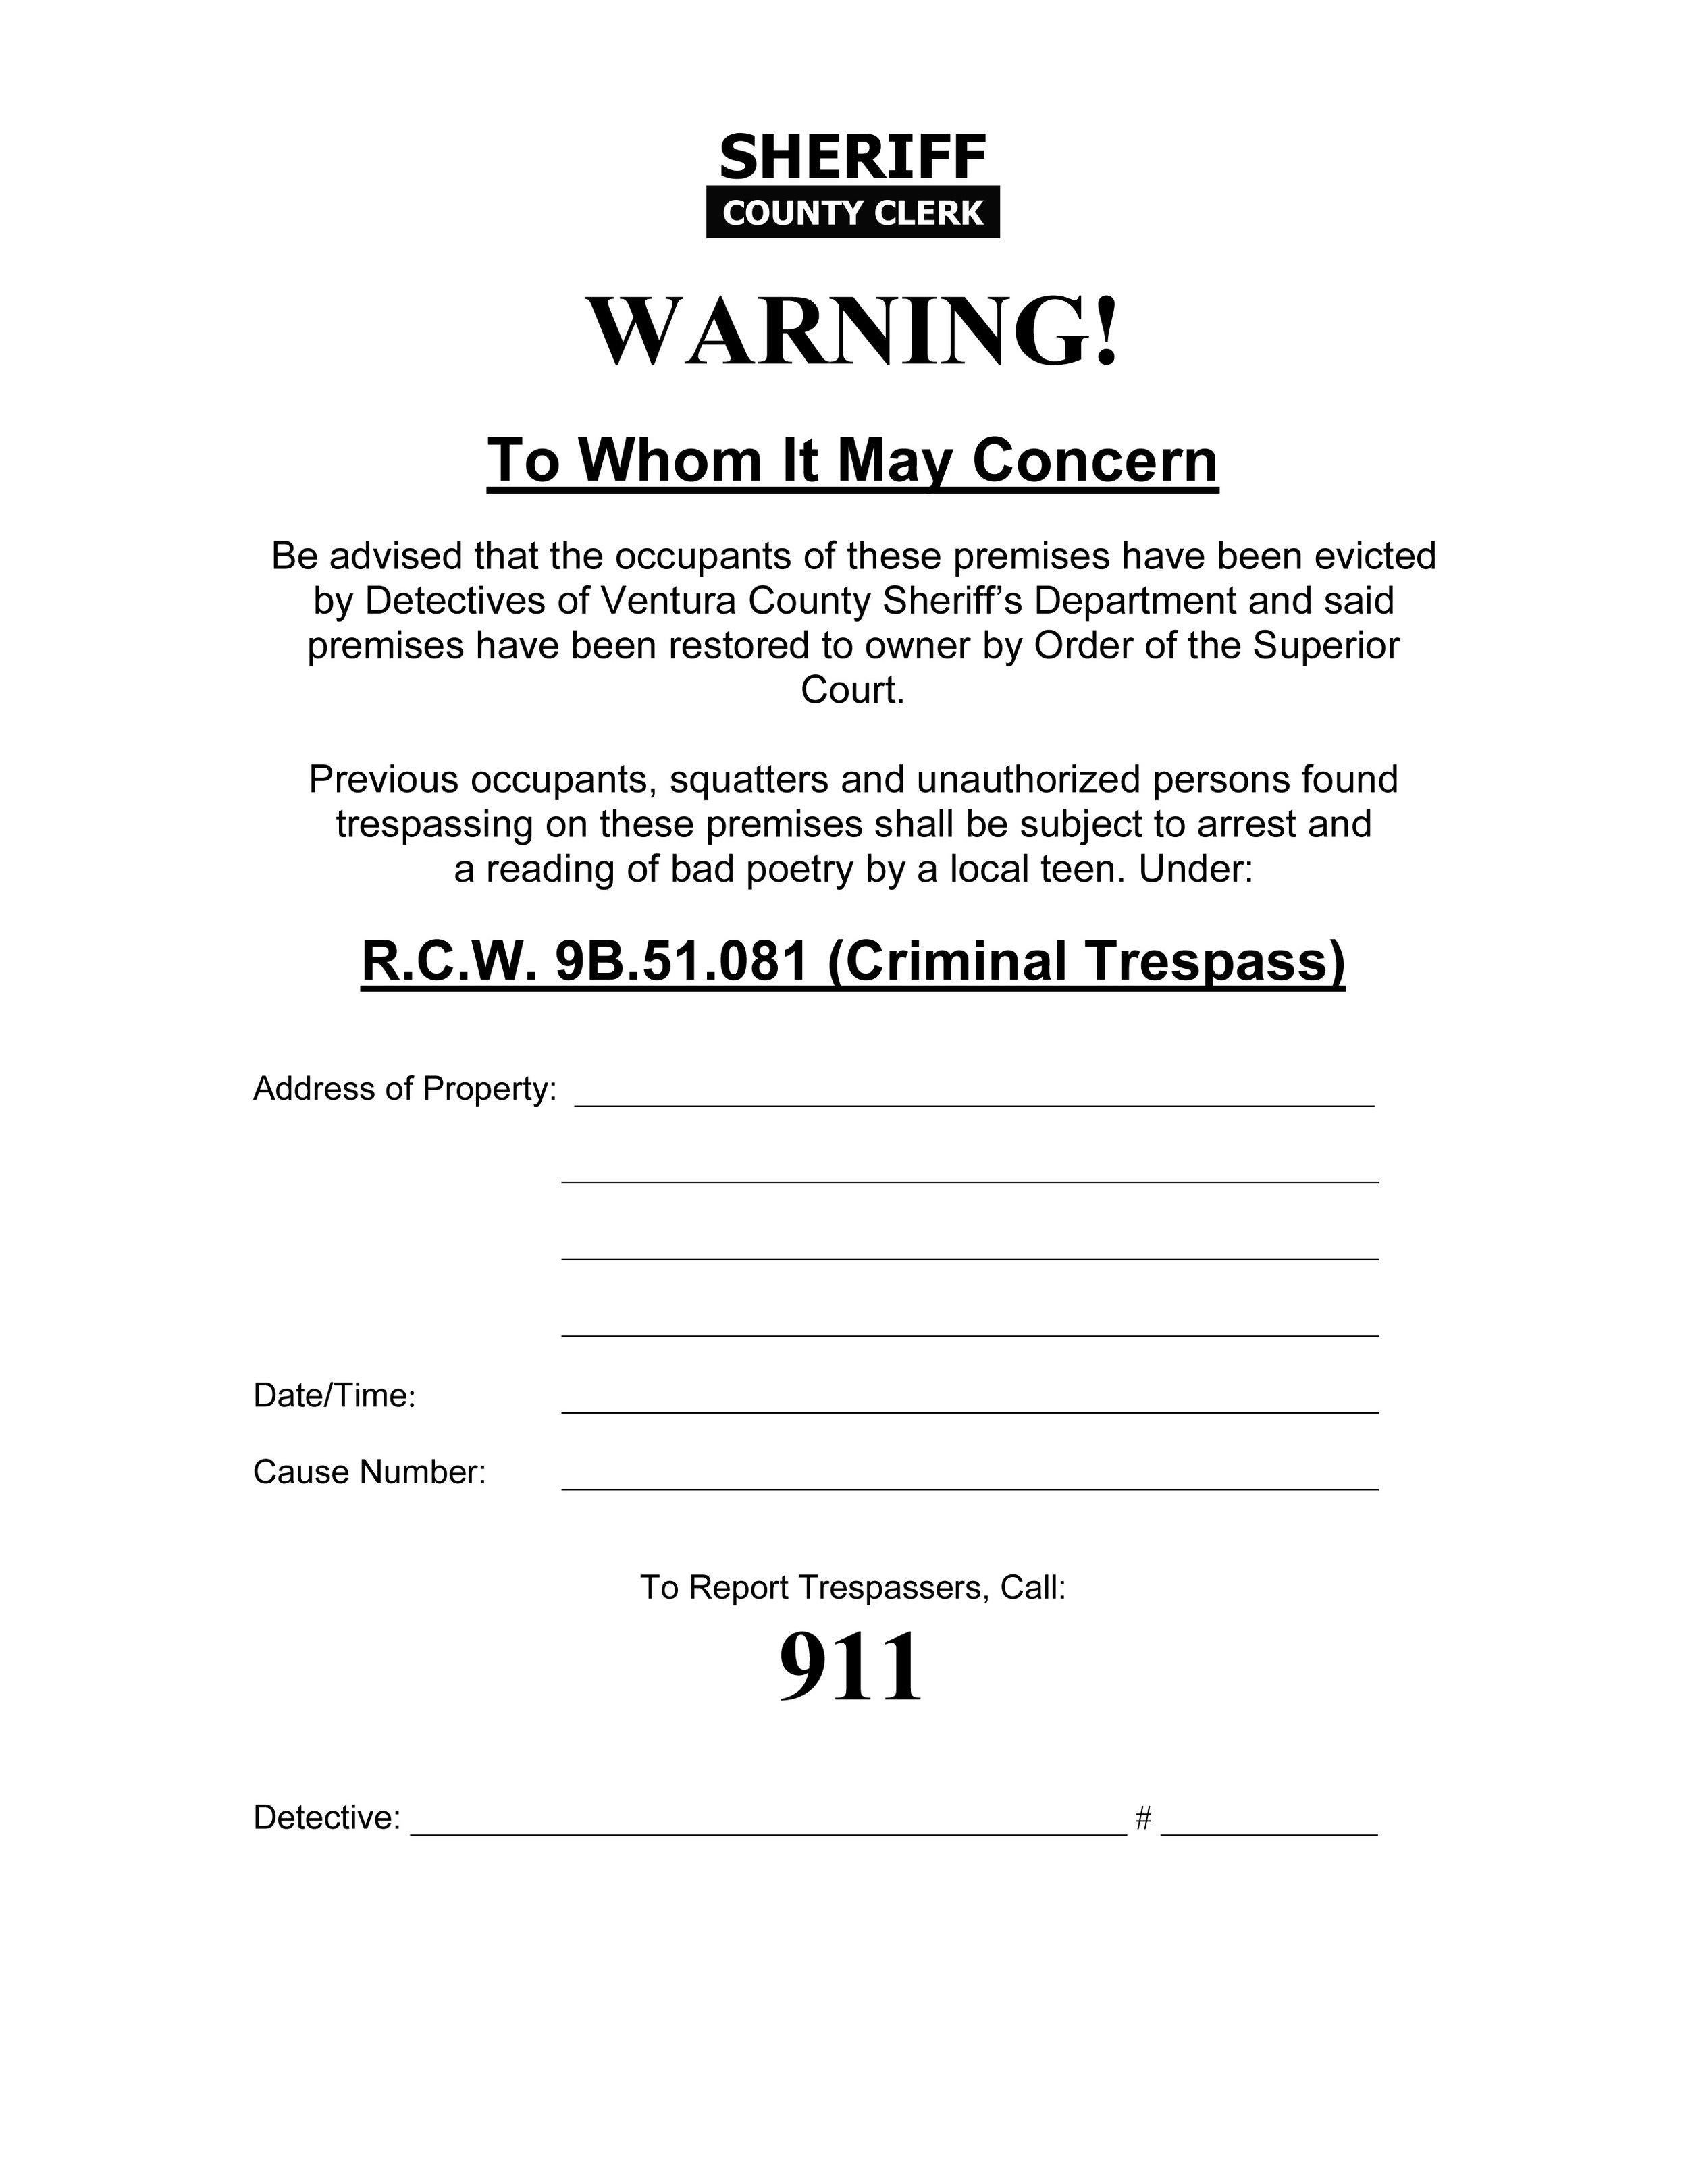 JG warning bleu.jpg